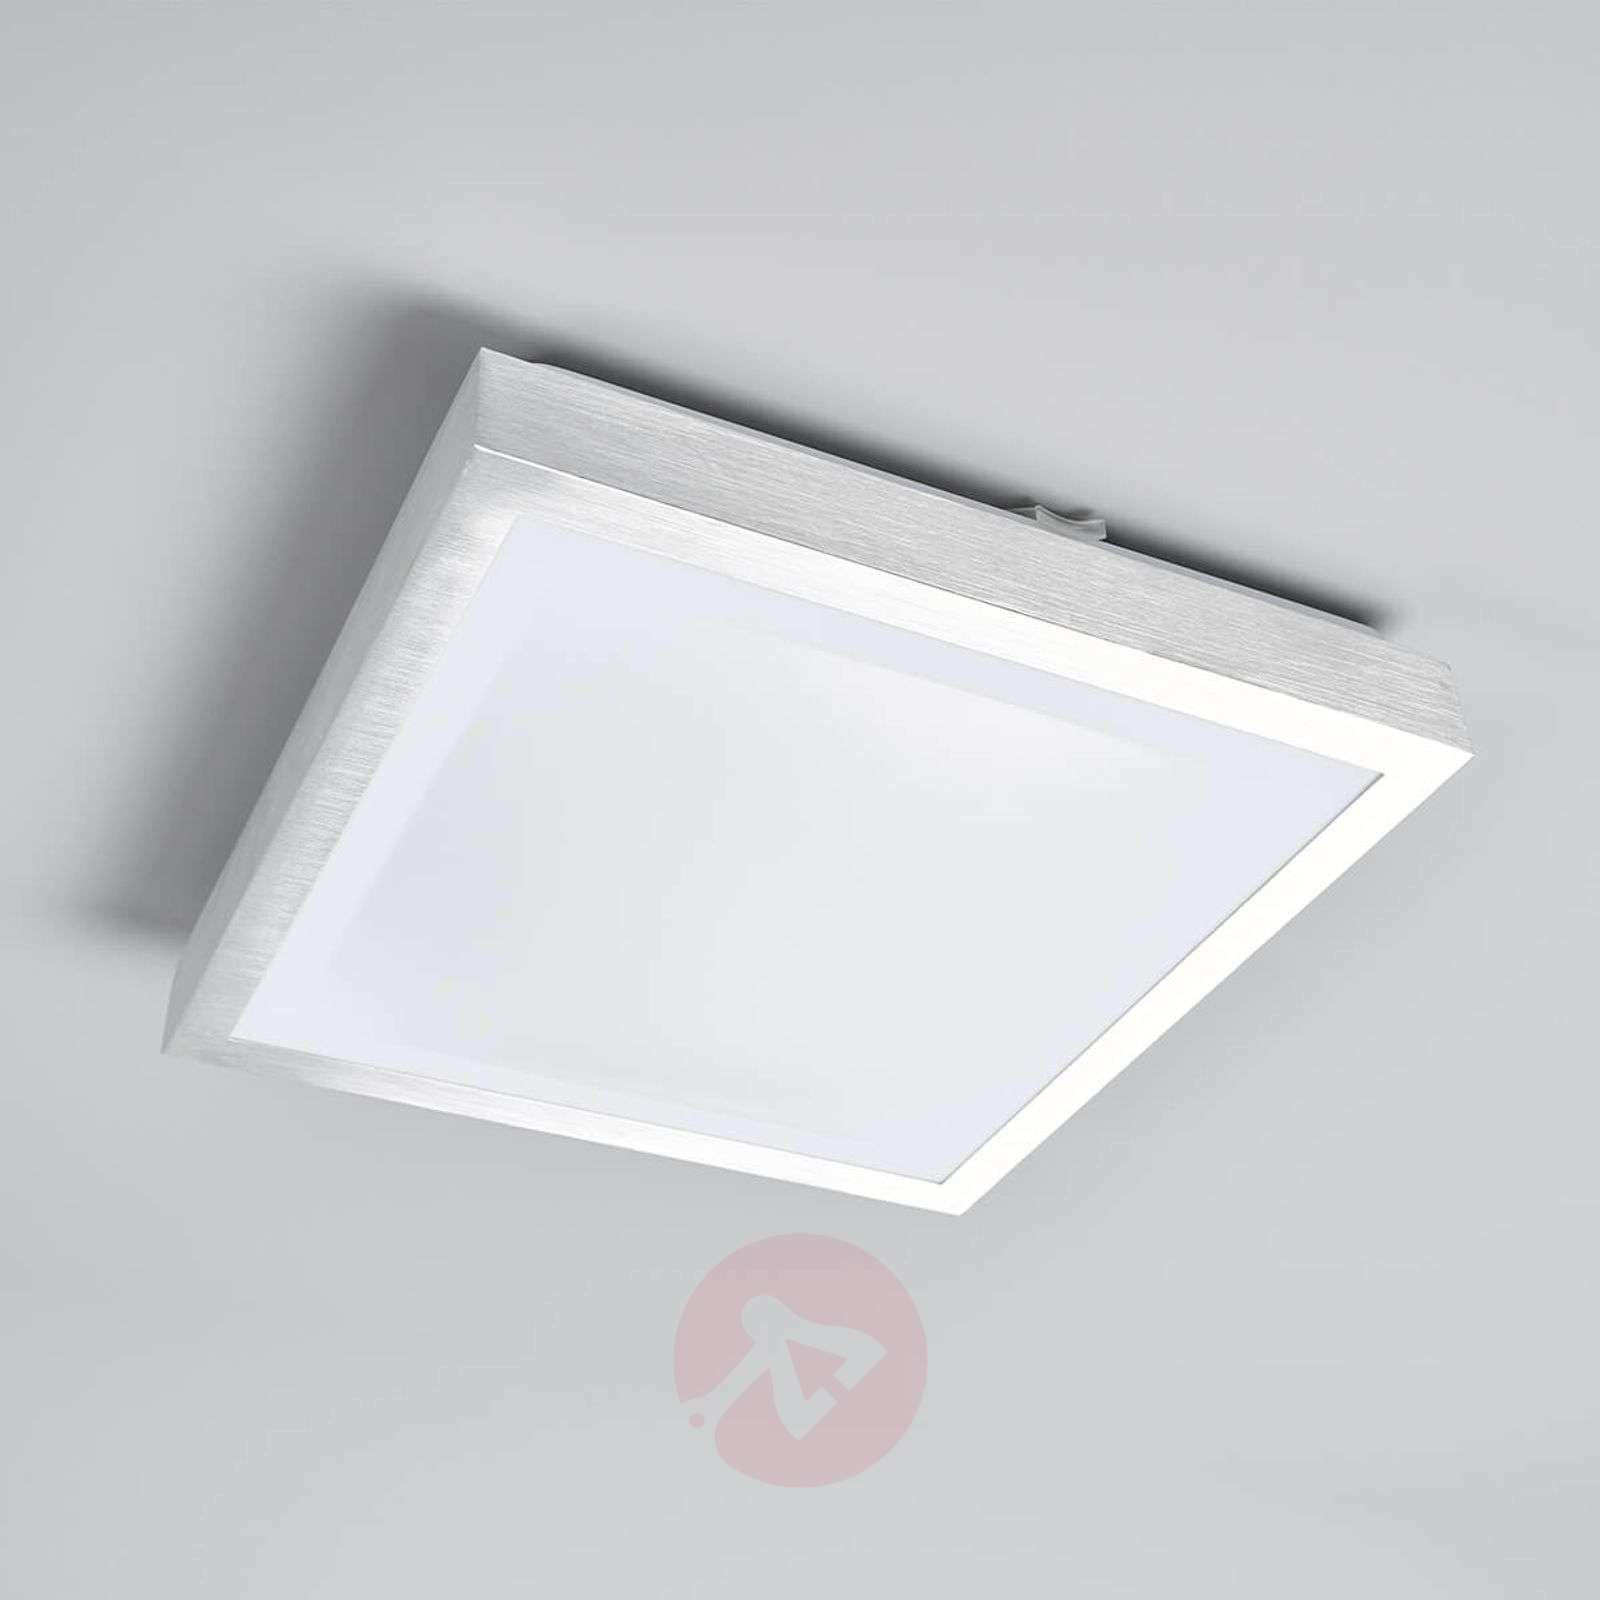 Kulmikas Robito-LED-kattovalaisin, alumiini-9974012-01